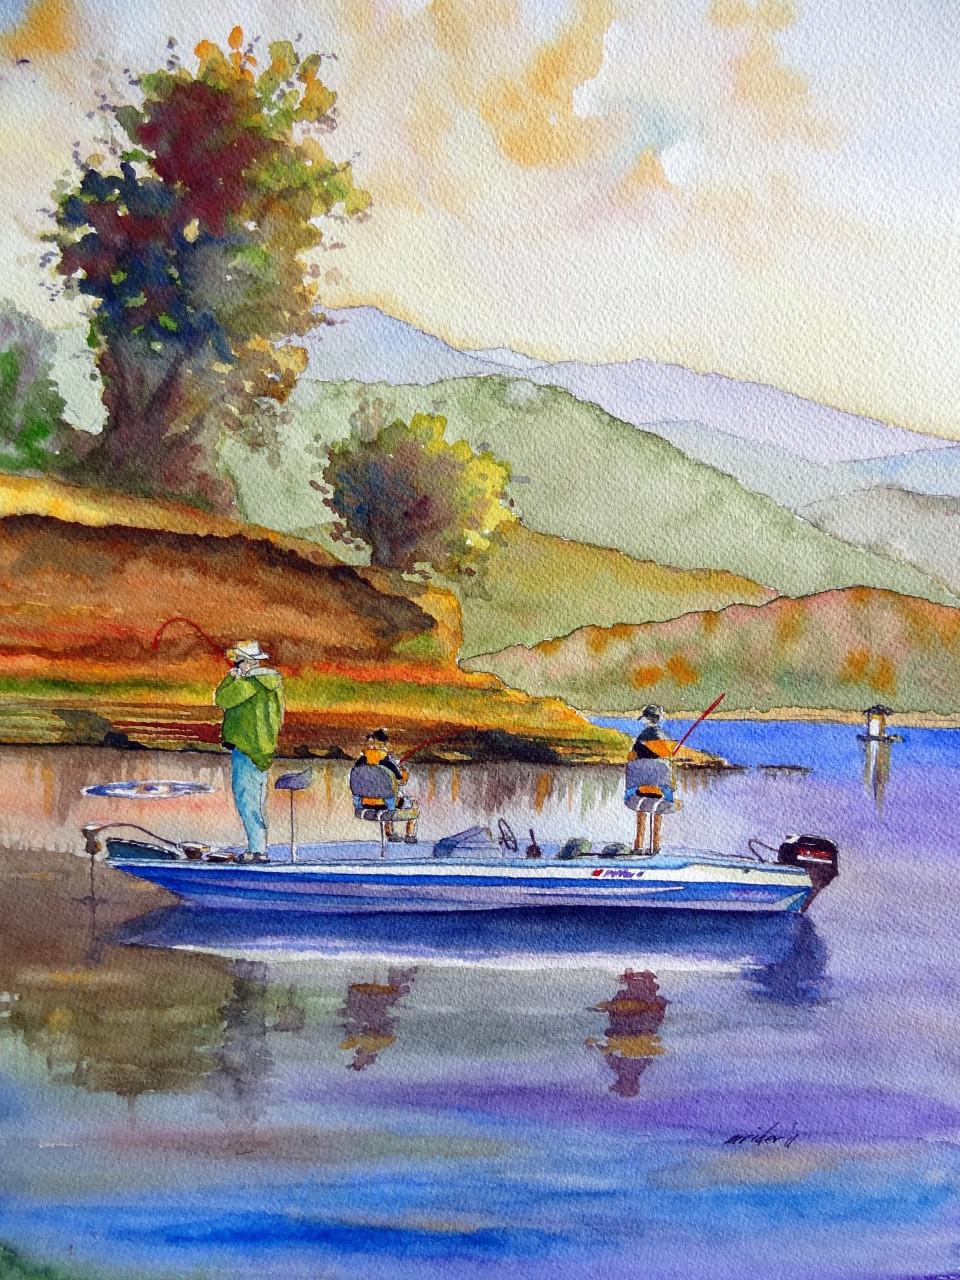 Lake Cachuma Fishermen